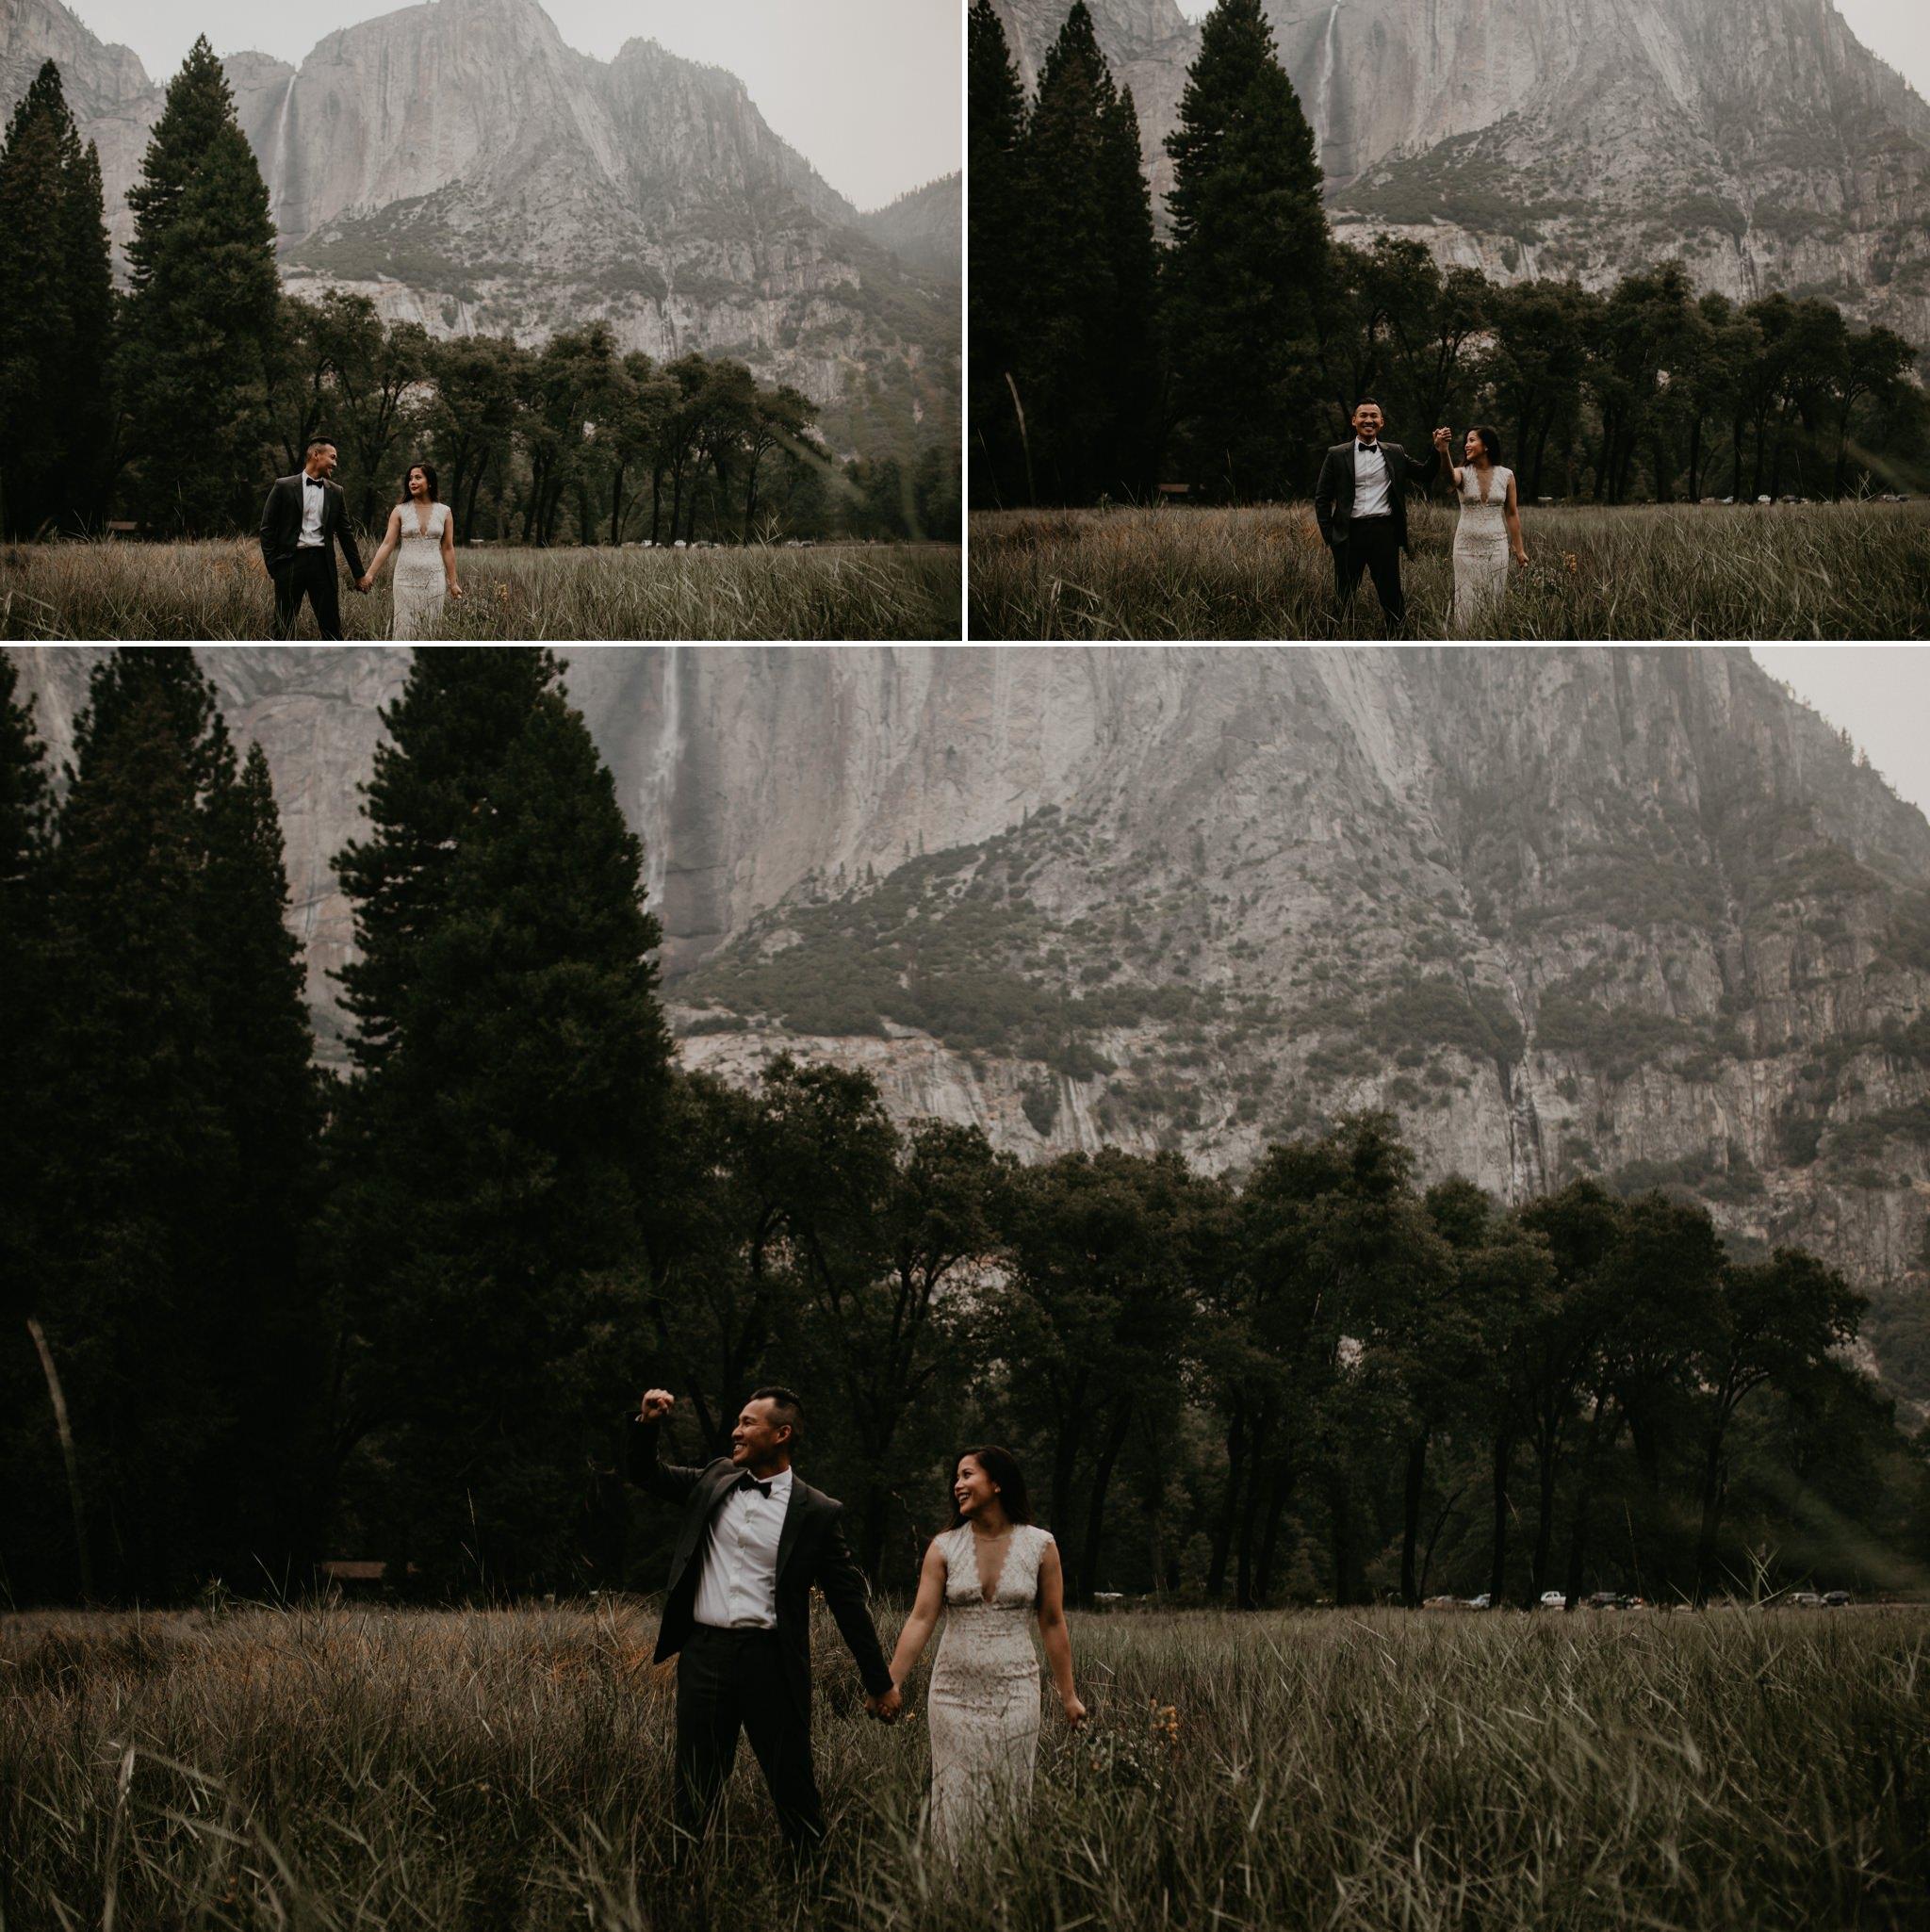 Yosemite-Valley-Wedding5.jpg